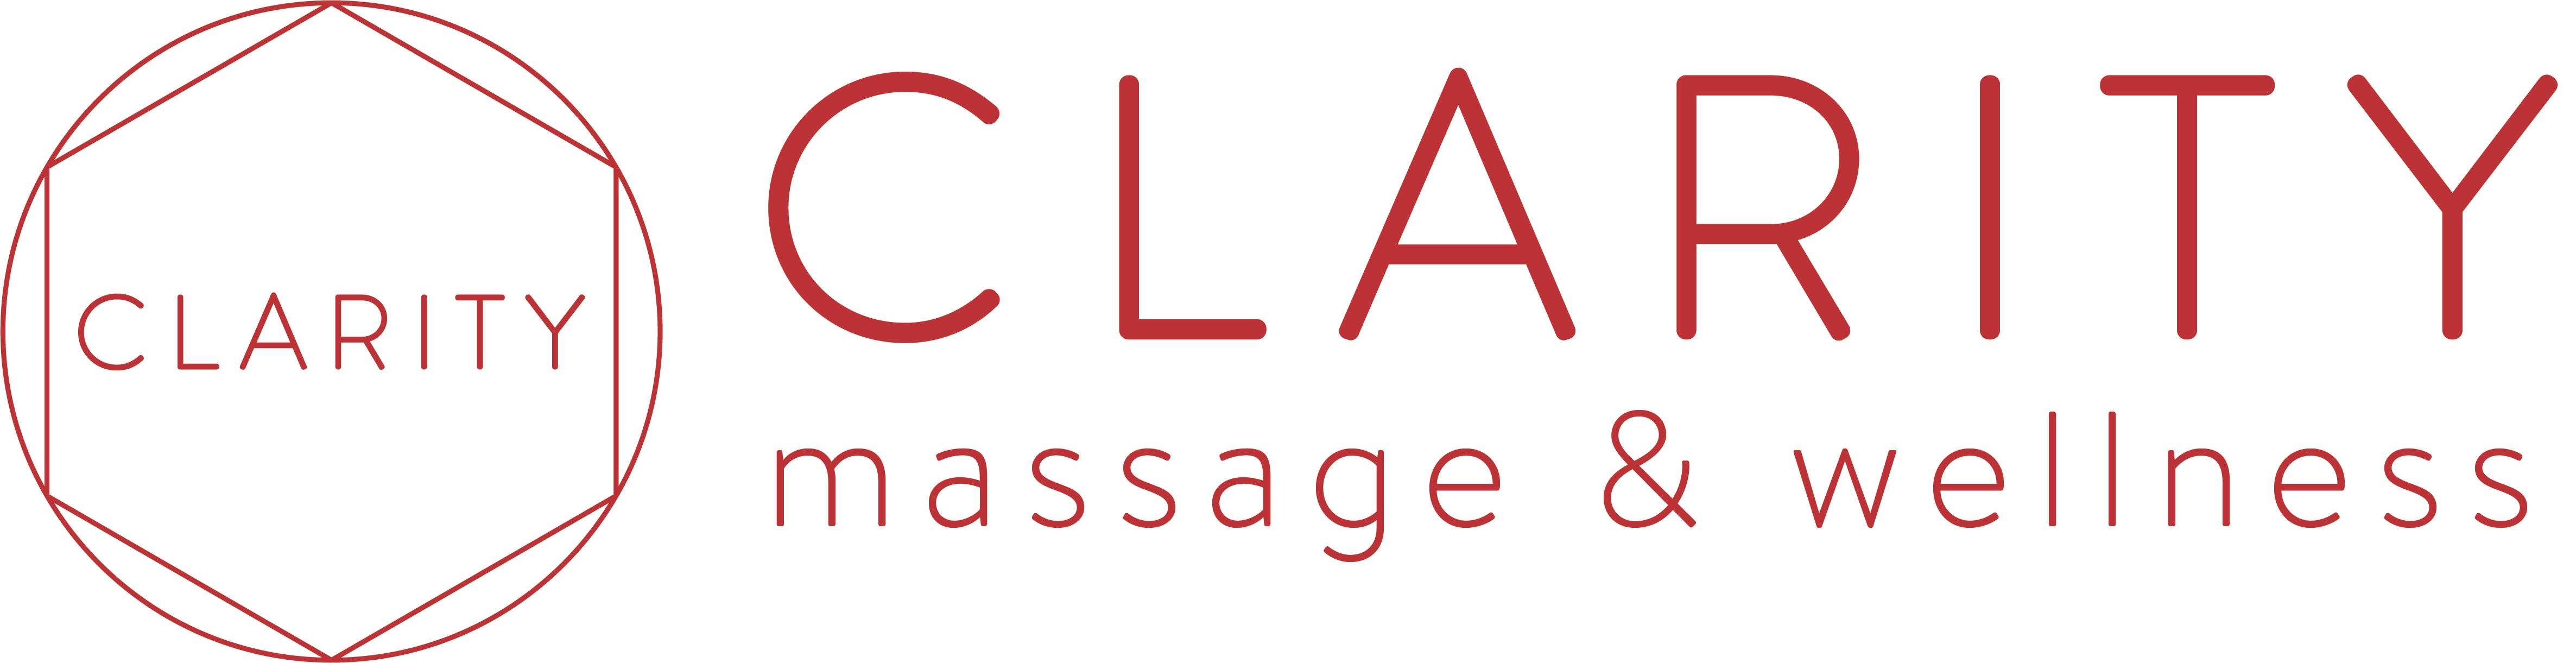 Clarity Massage and Wellness